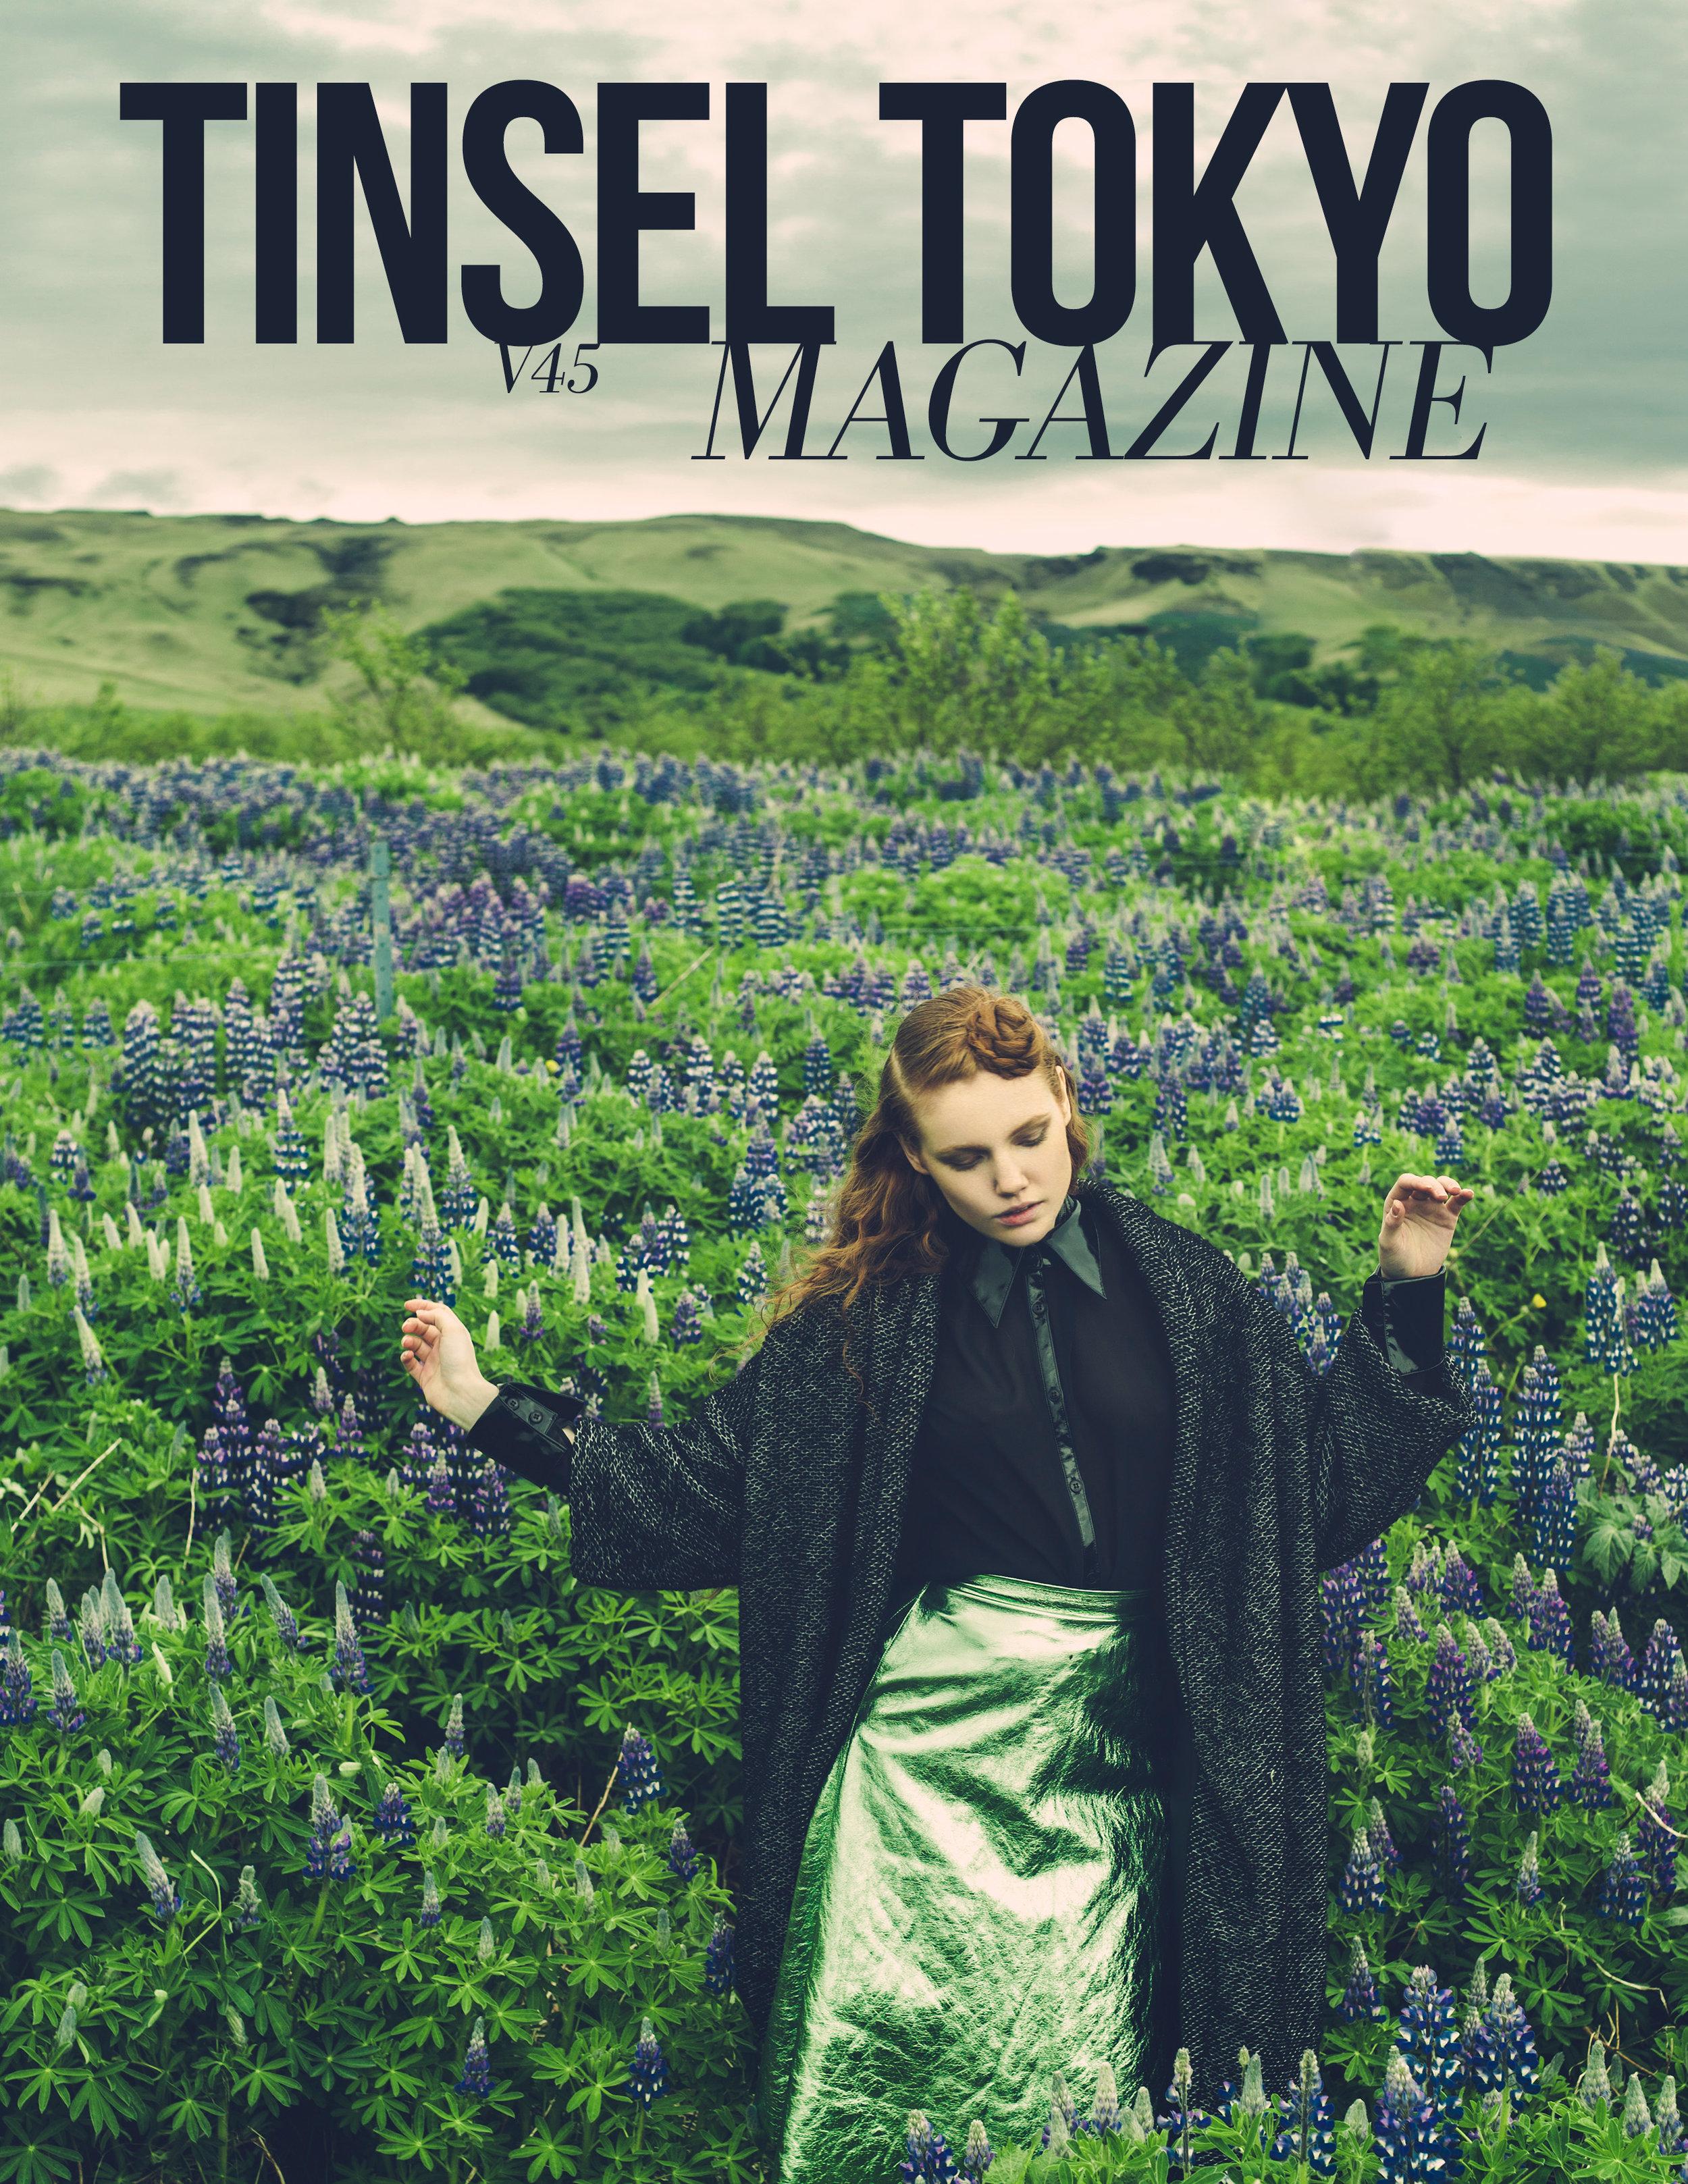 Tinsel Tokyo Magazine Cover